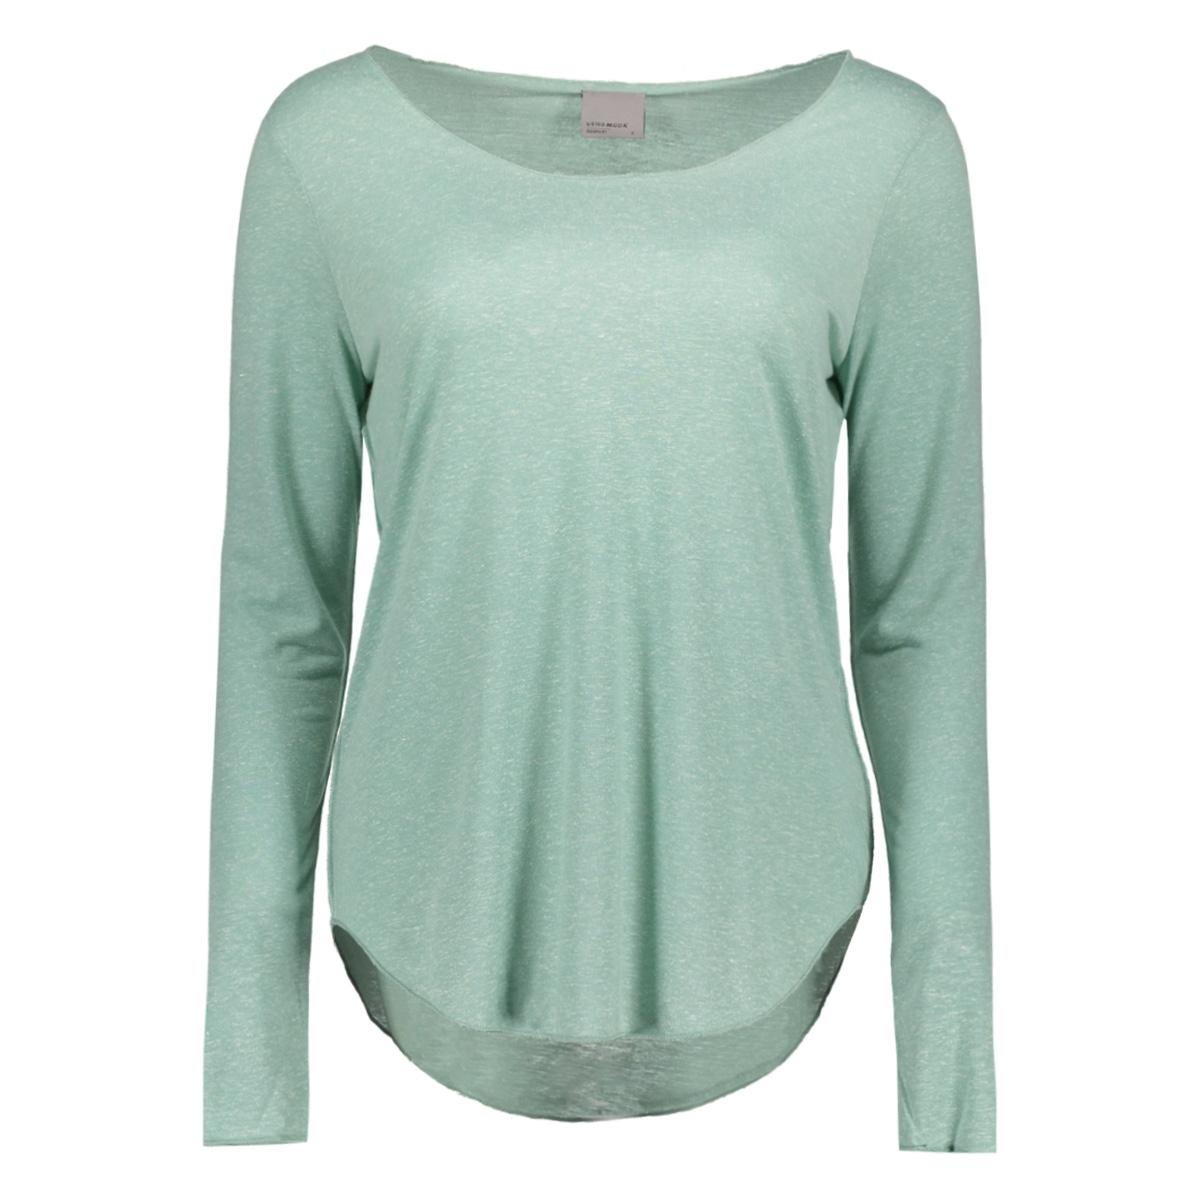 vmlua ls top noos 10158658 vero moda t-shirt blue surf